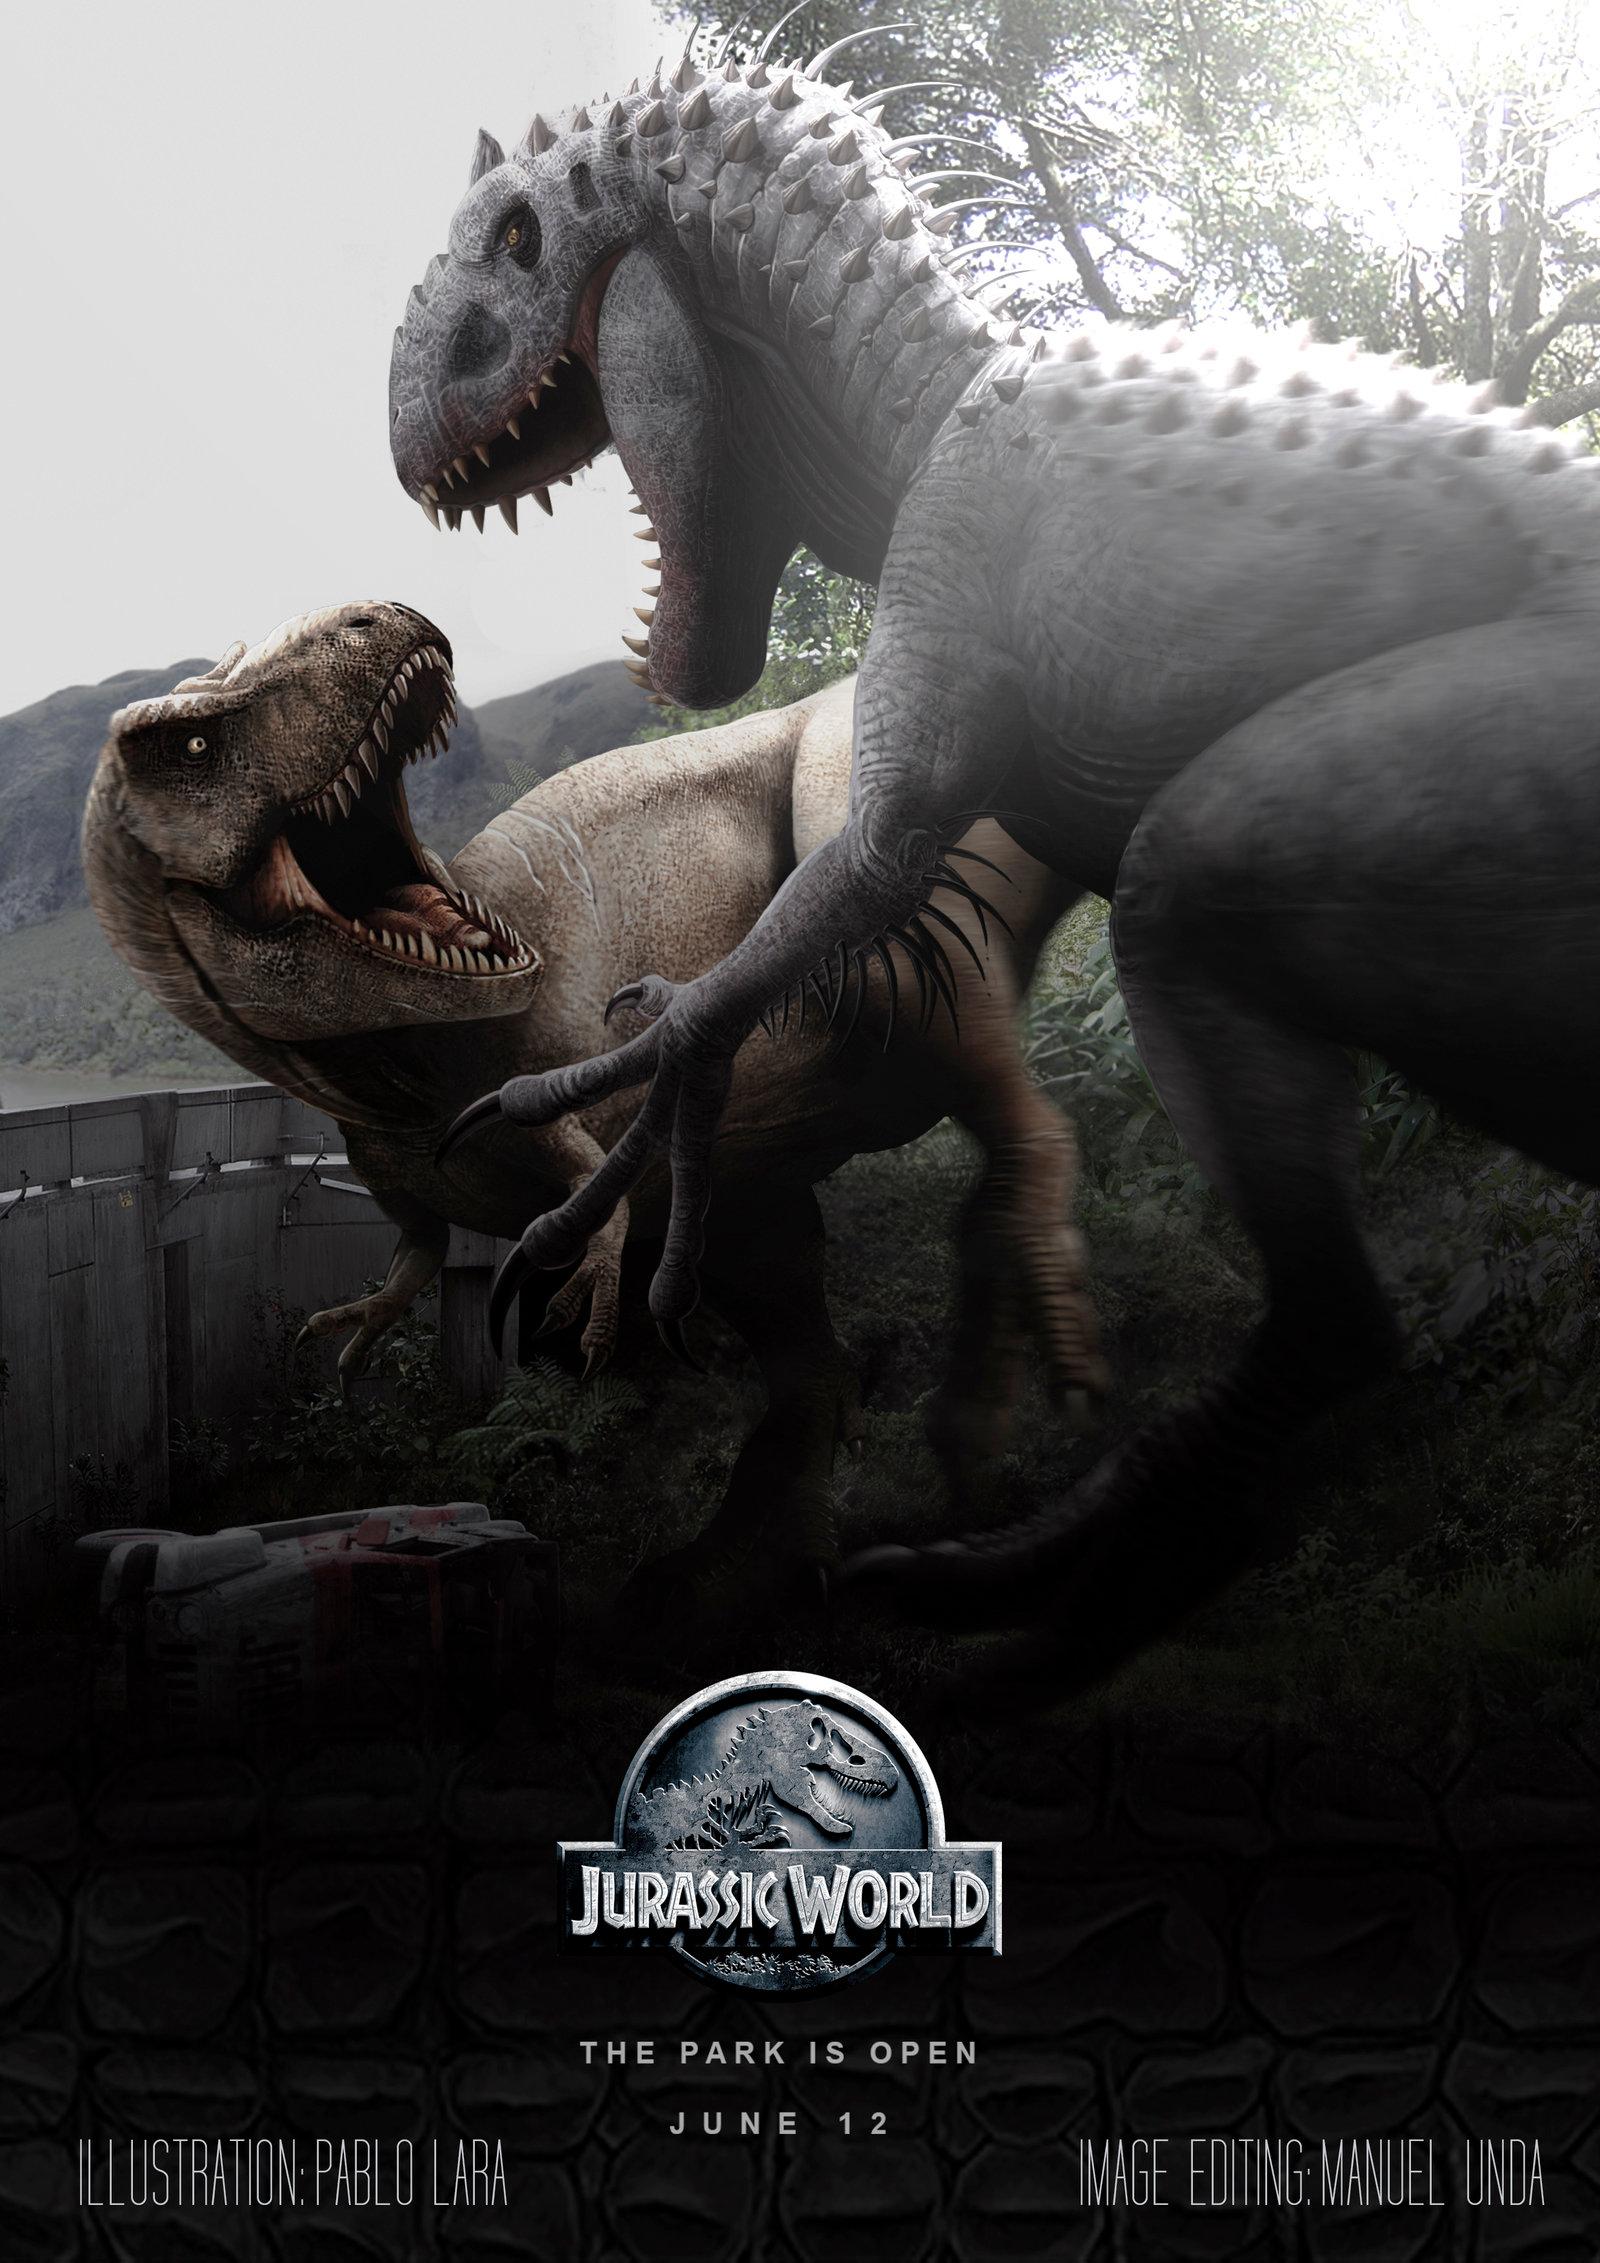 JURASSIC WORLD Jurassic Park Know Your Meme